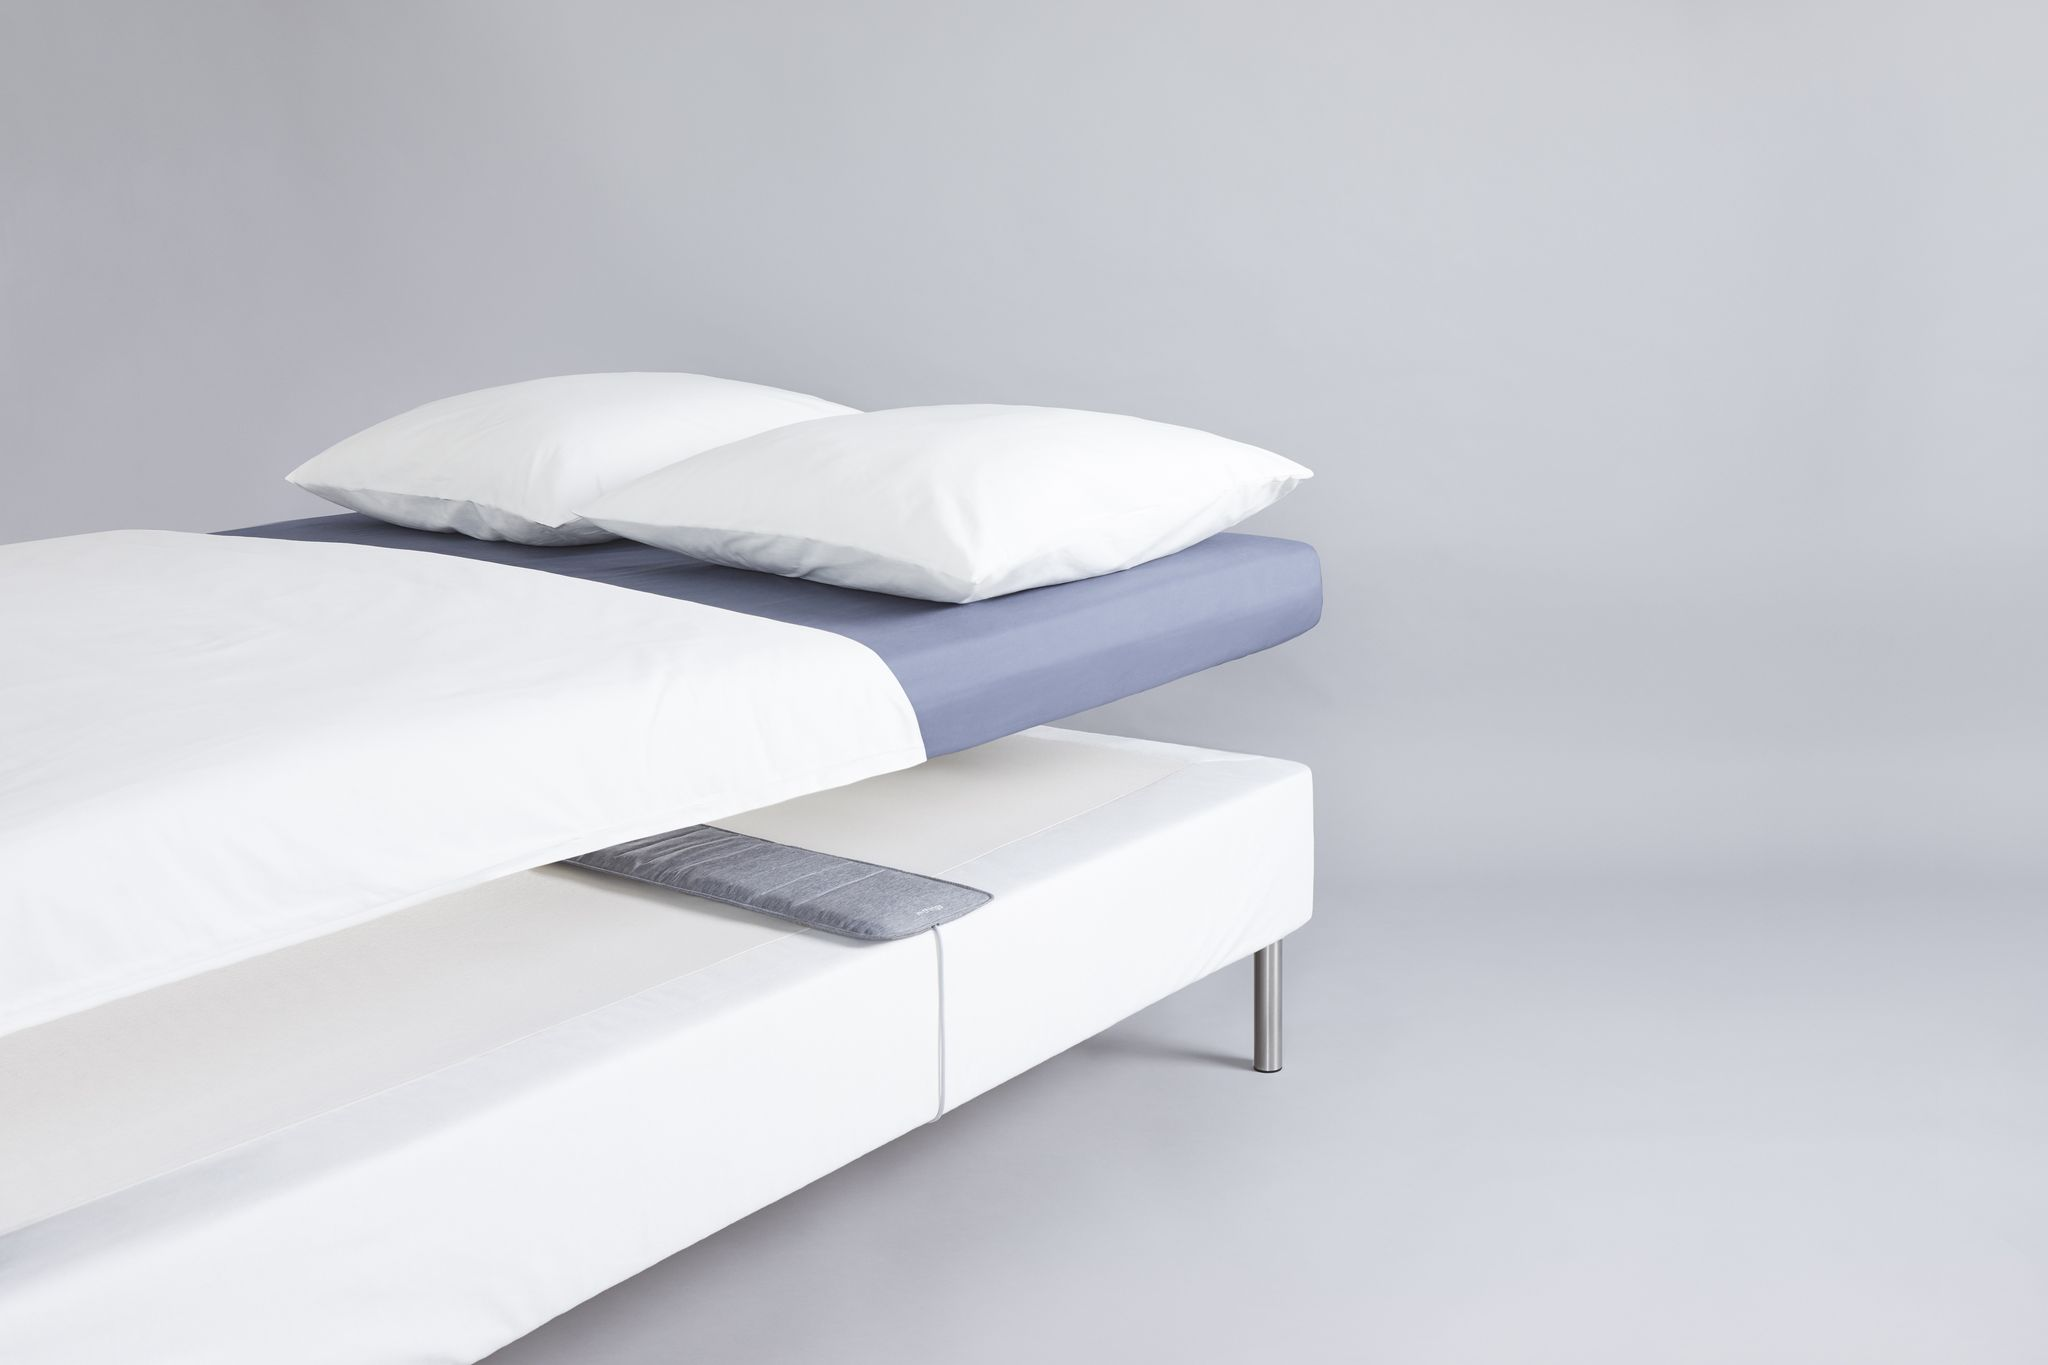 witings sleep analyzer/withings sleep analyzer bed